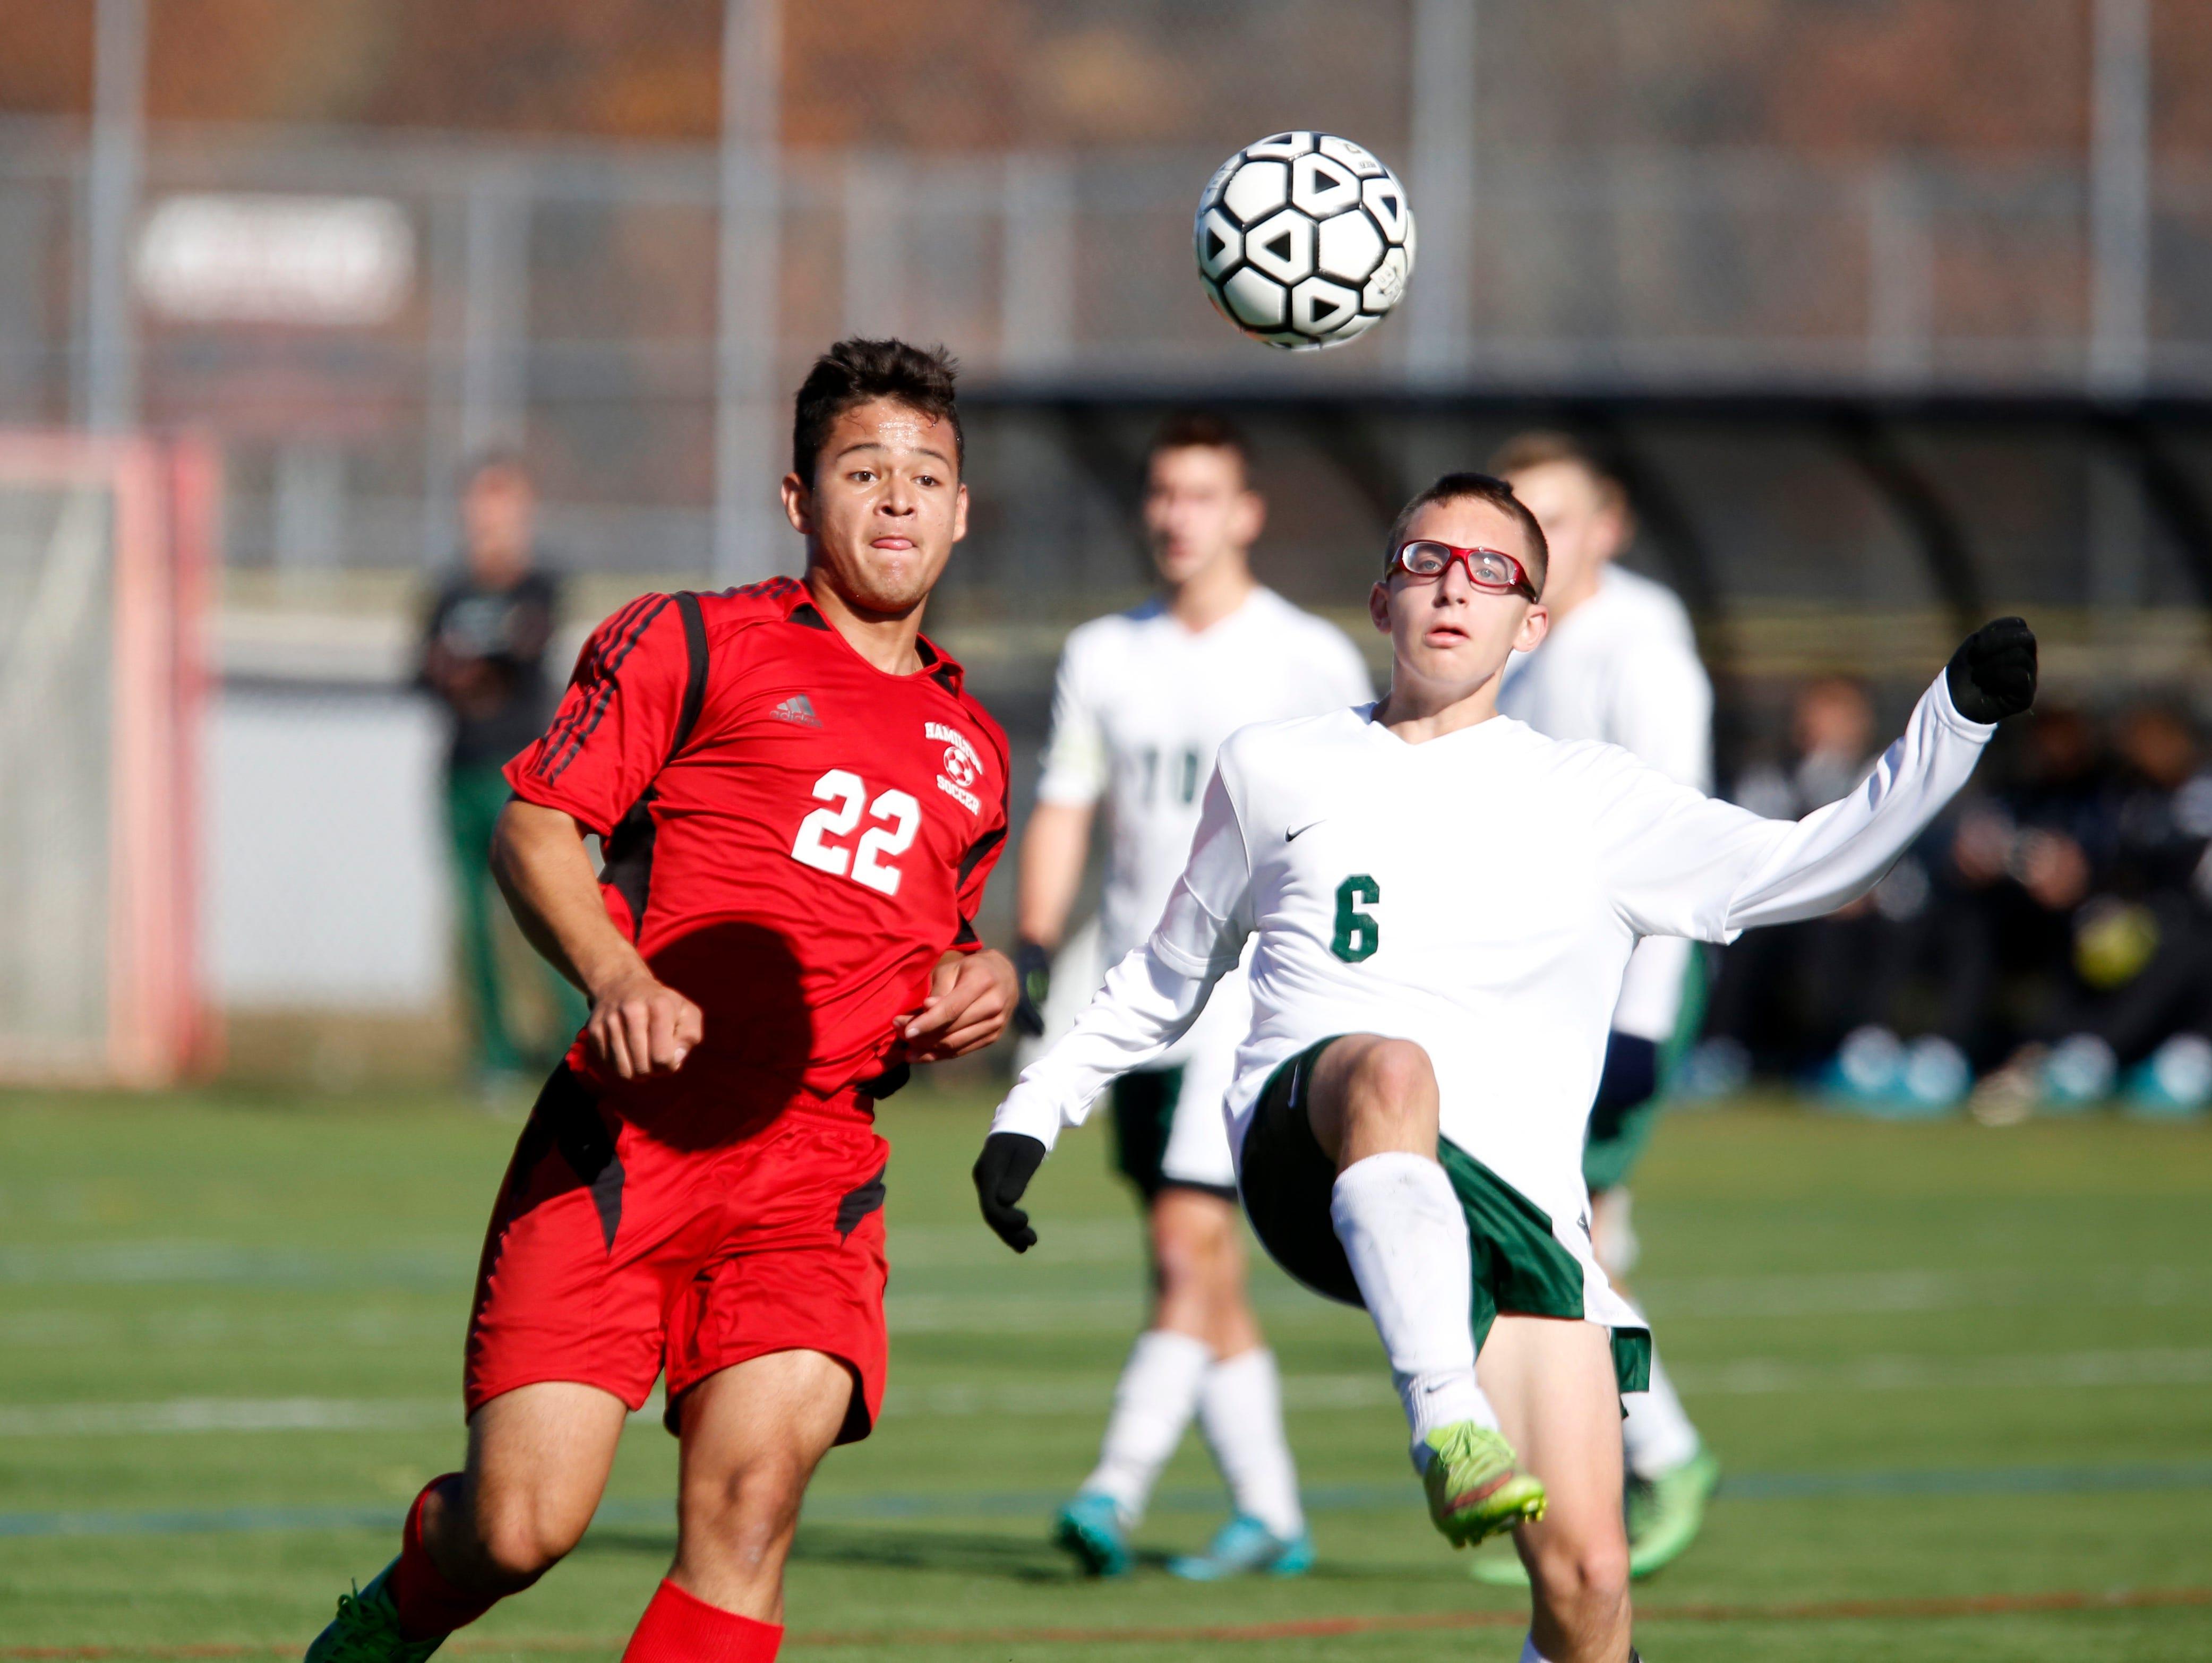 Hamilton's Virglio Cruz and Solomon Schechter's Ben Levin battle for possession in the Class C boys soccer final Oct. 30, 2015 at Arlington High School in Lagrangeville. Solomon Schechter won, 2-1, in overtime.